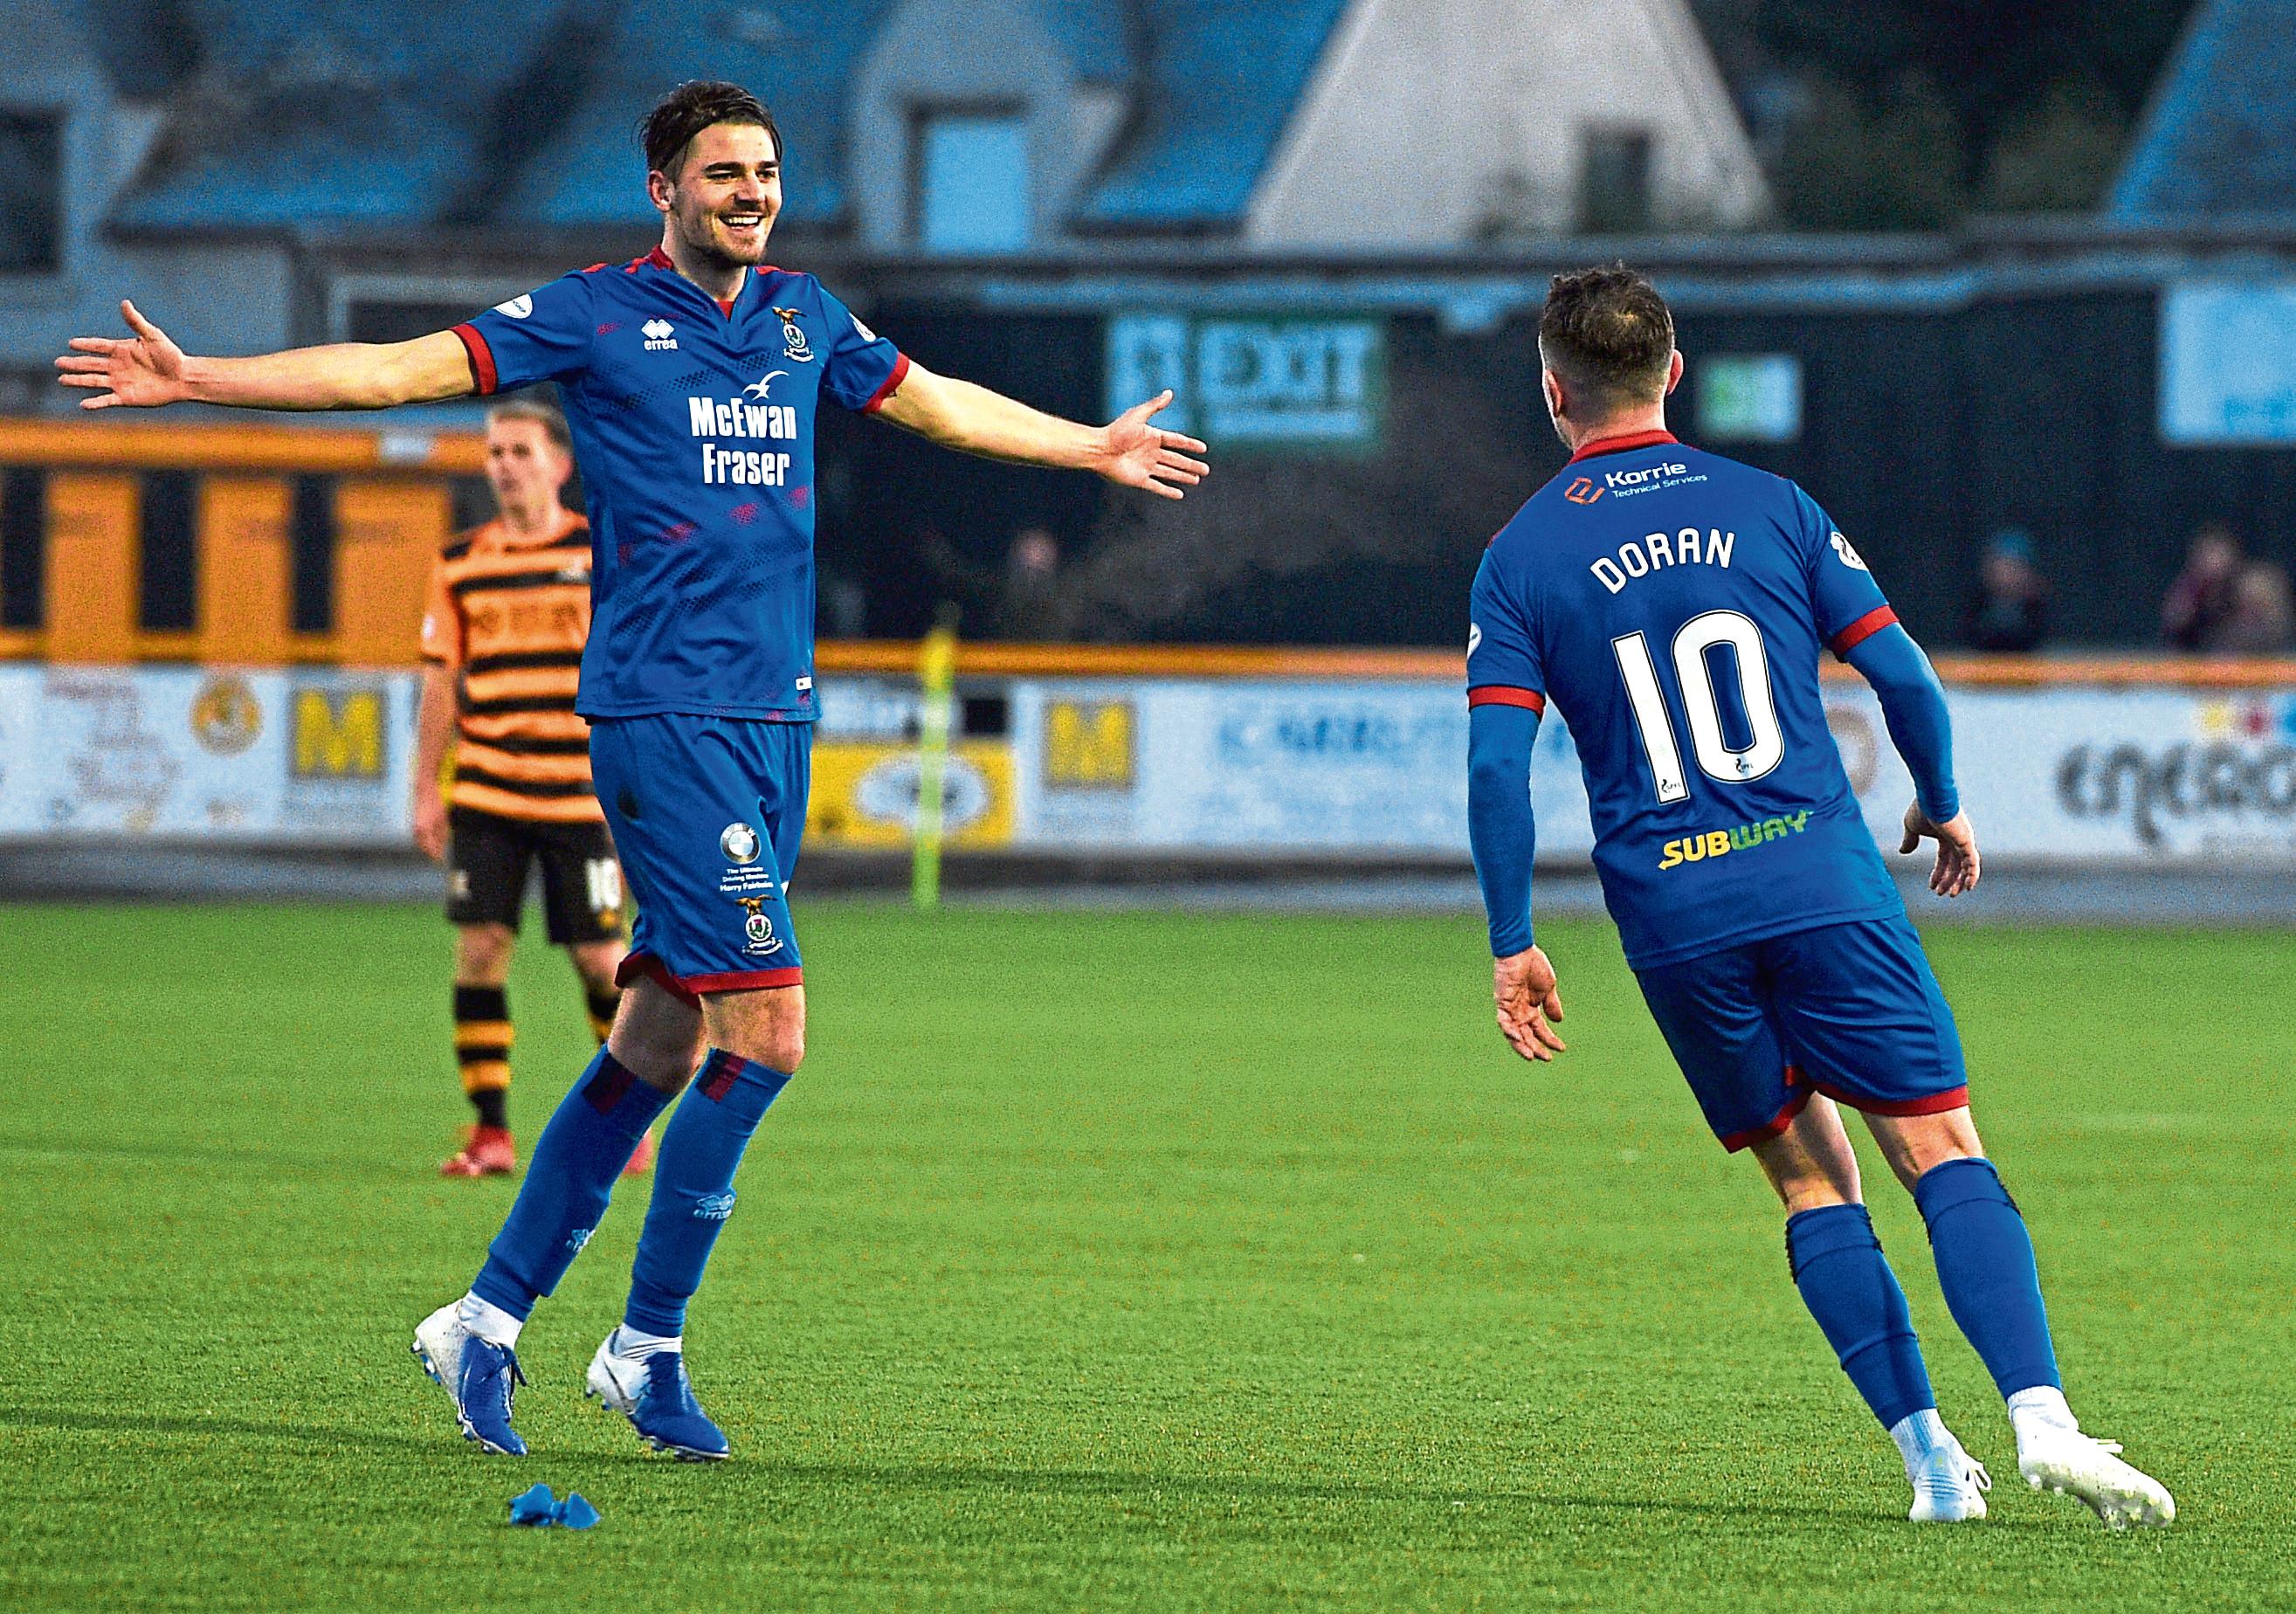 Inverness' Charlie Trafford, left, celebrates with goalscorer Aaron Doran